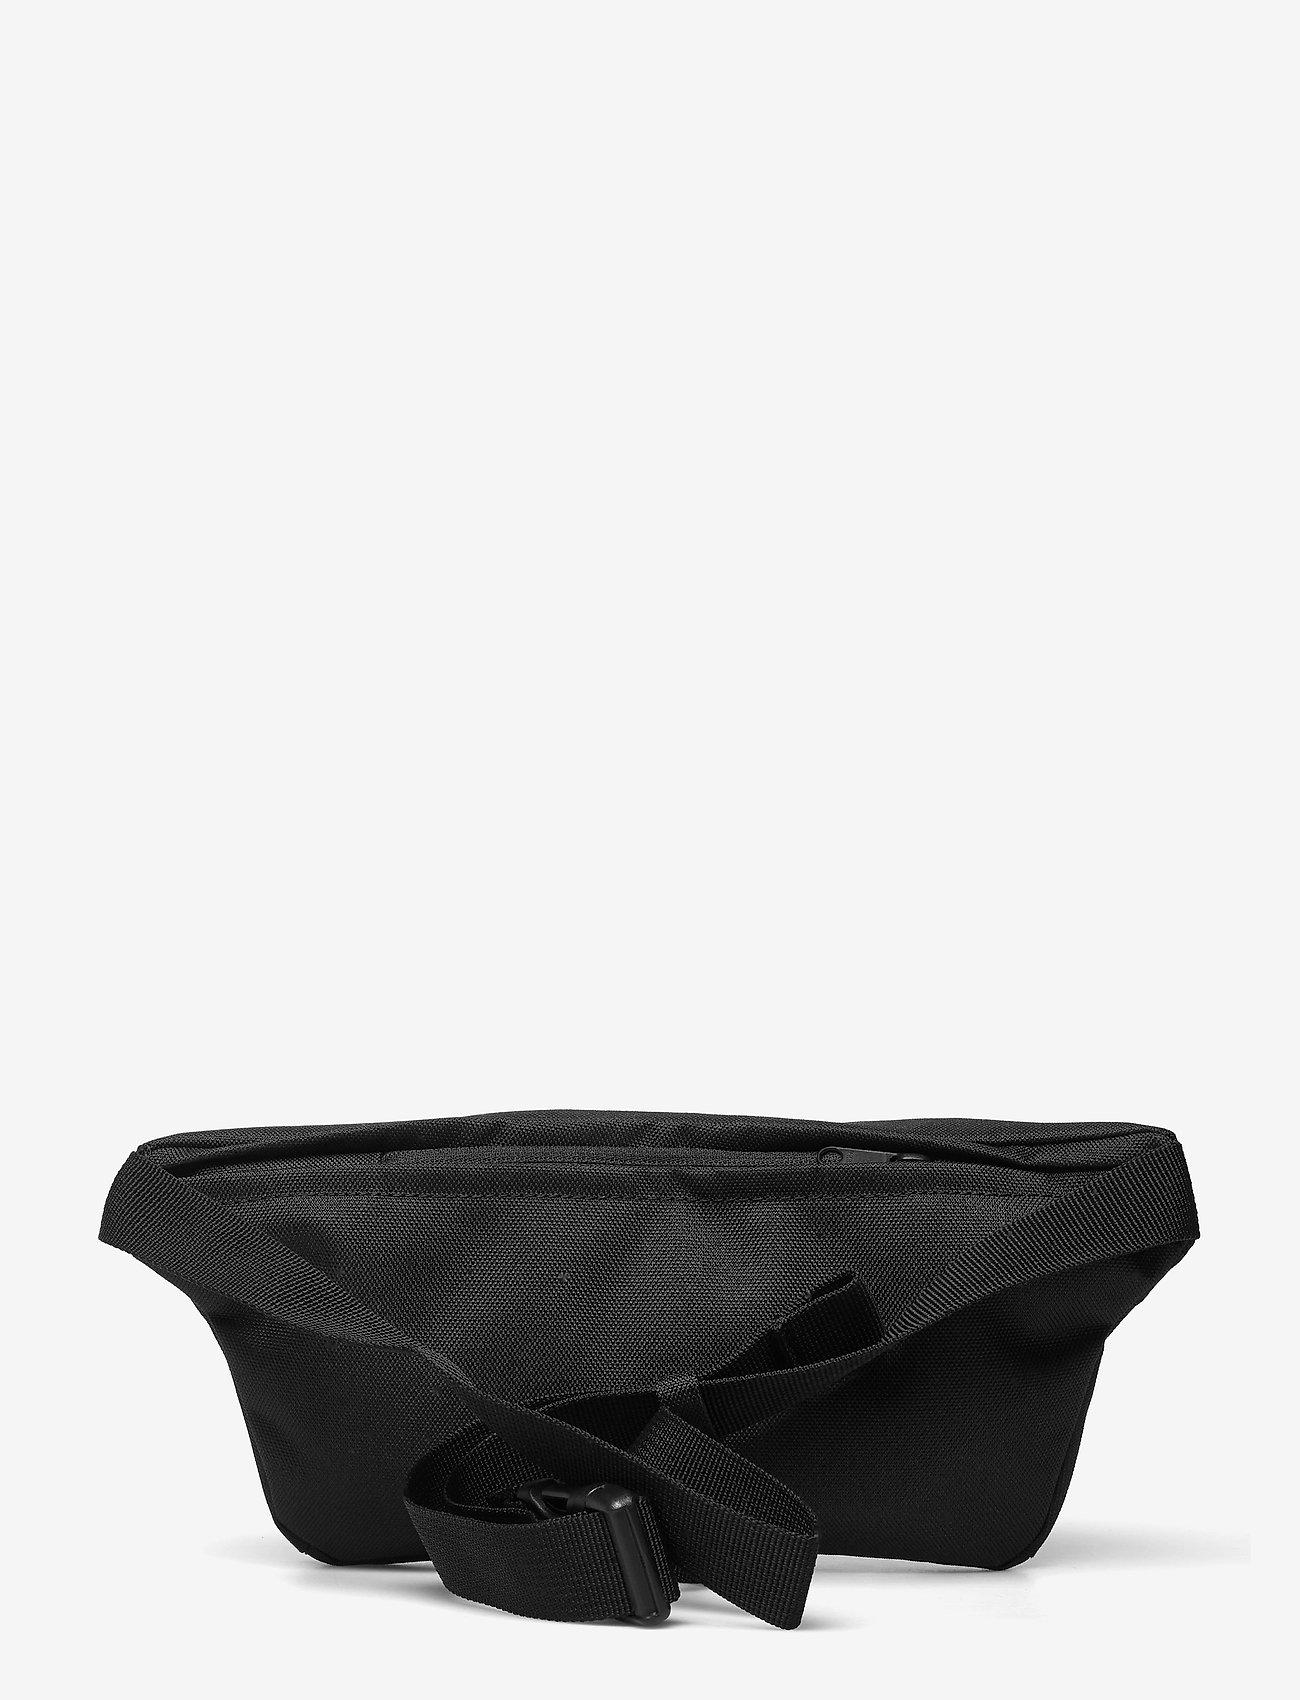 Levi's Footwear & Acc - Small Banana Sling - Wordmark - magväskor - regular black - 1